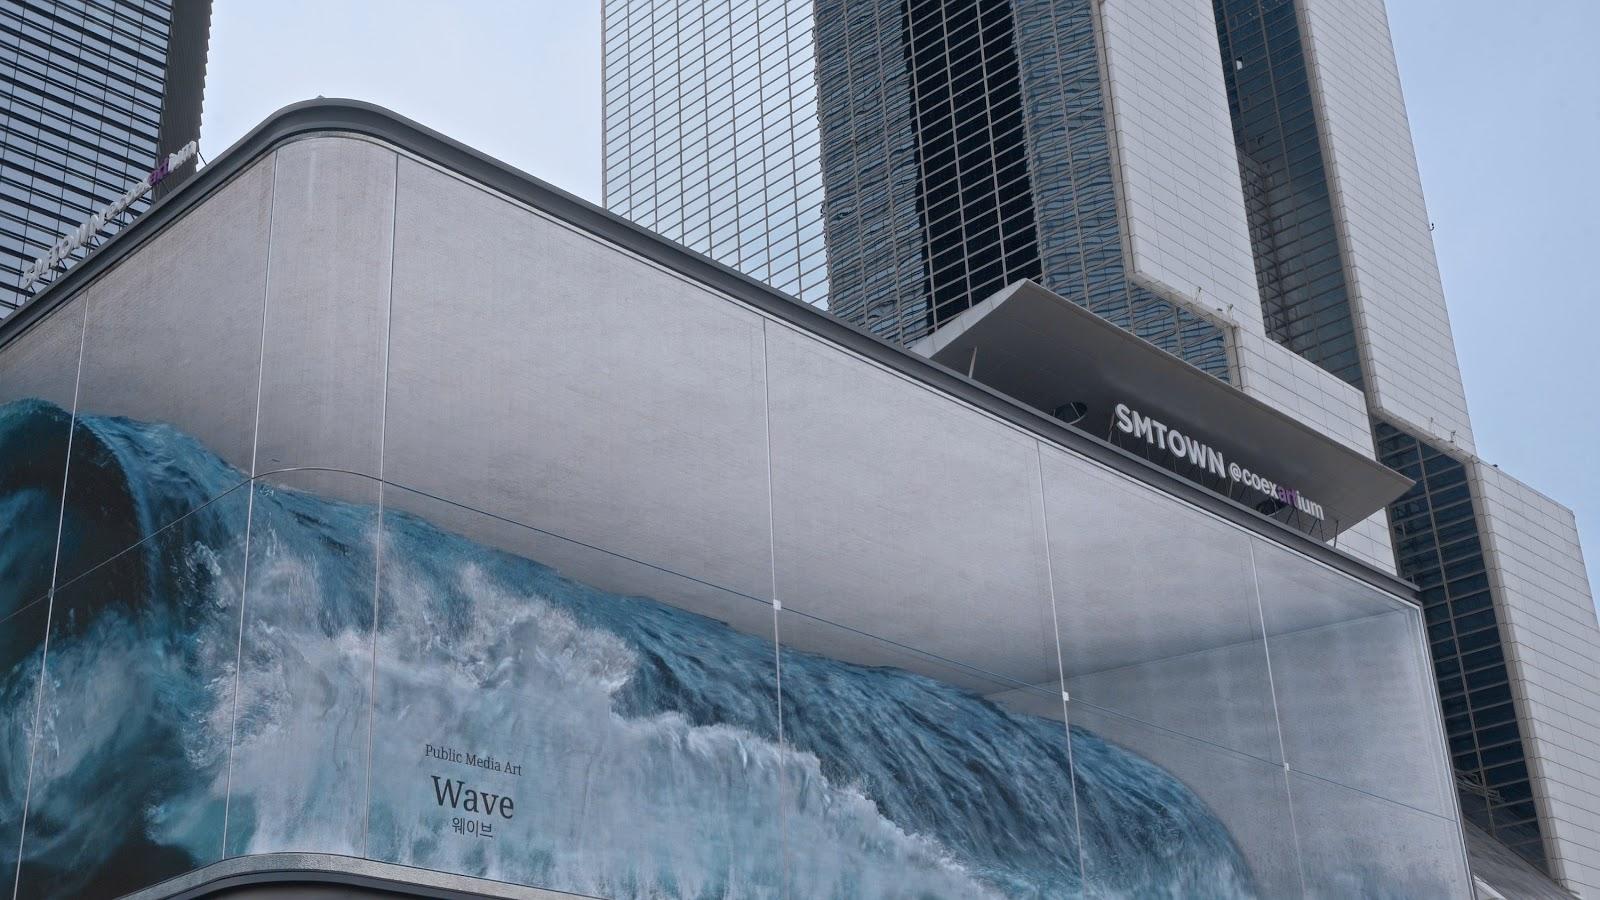 art installation billboard named Wave in South Korea